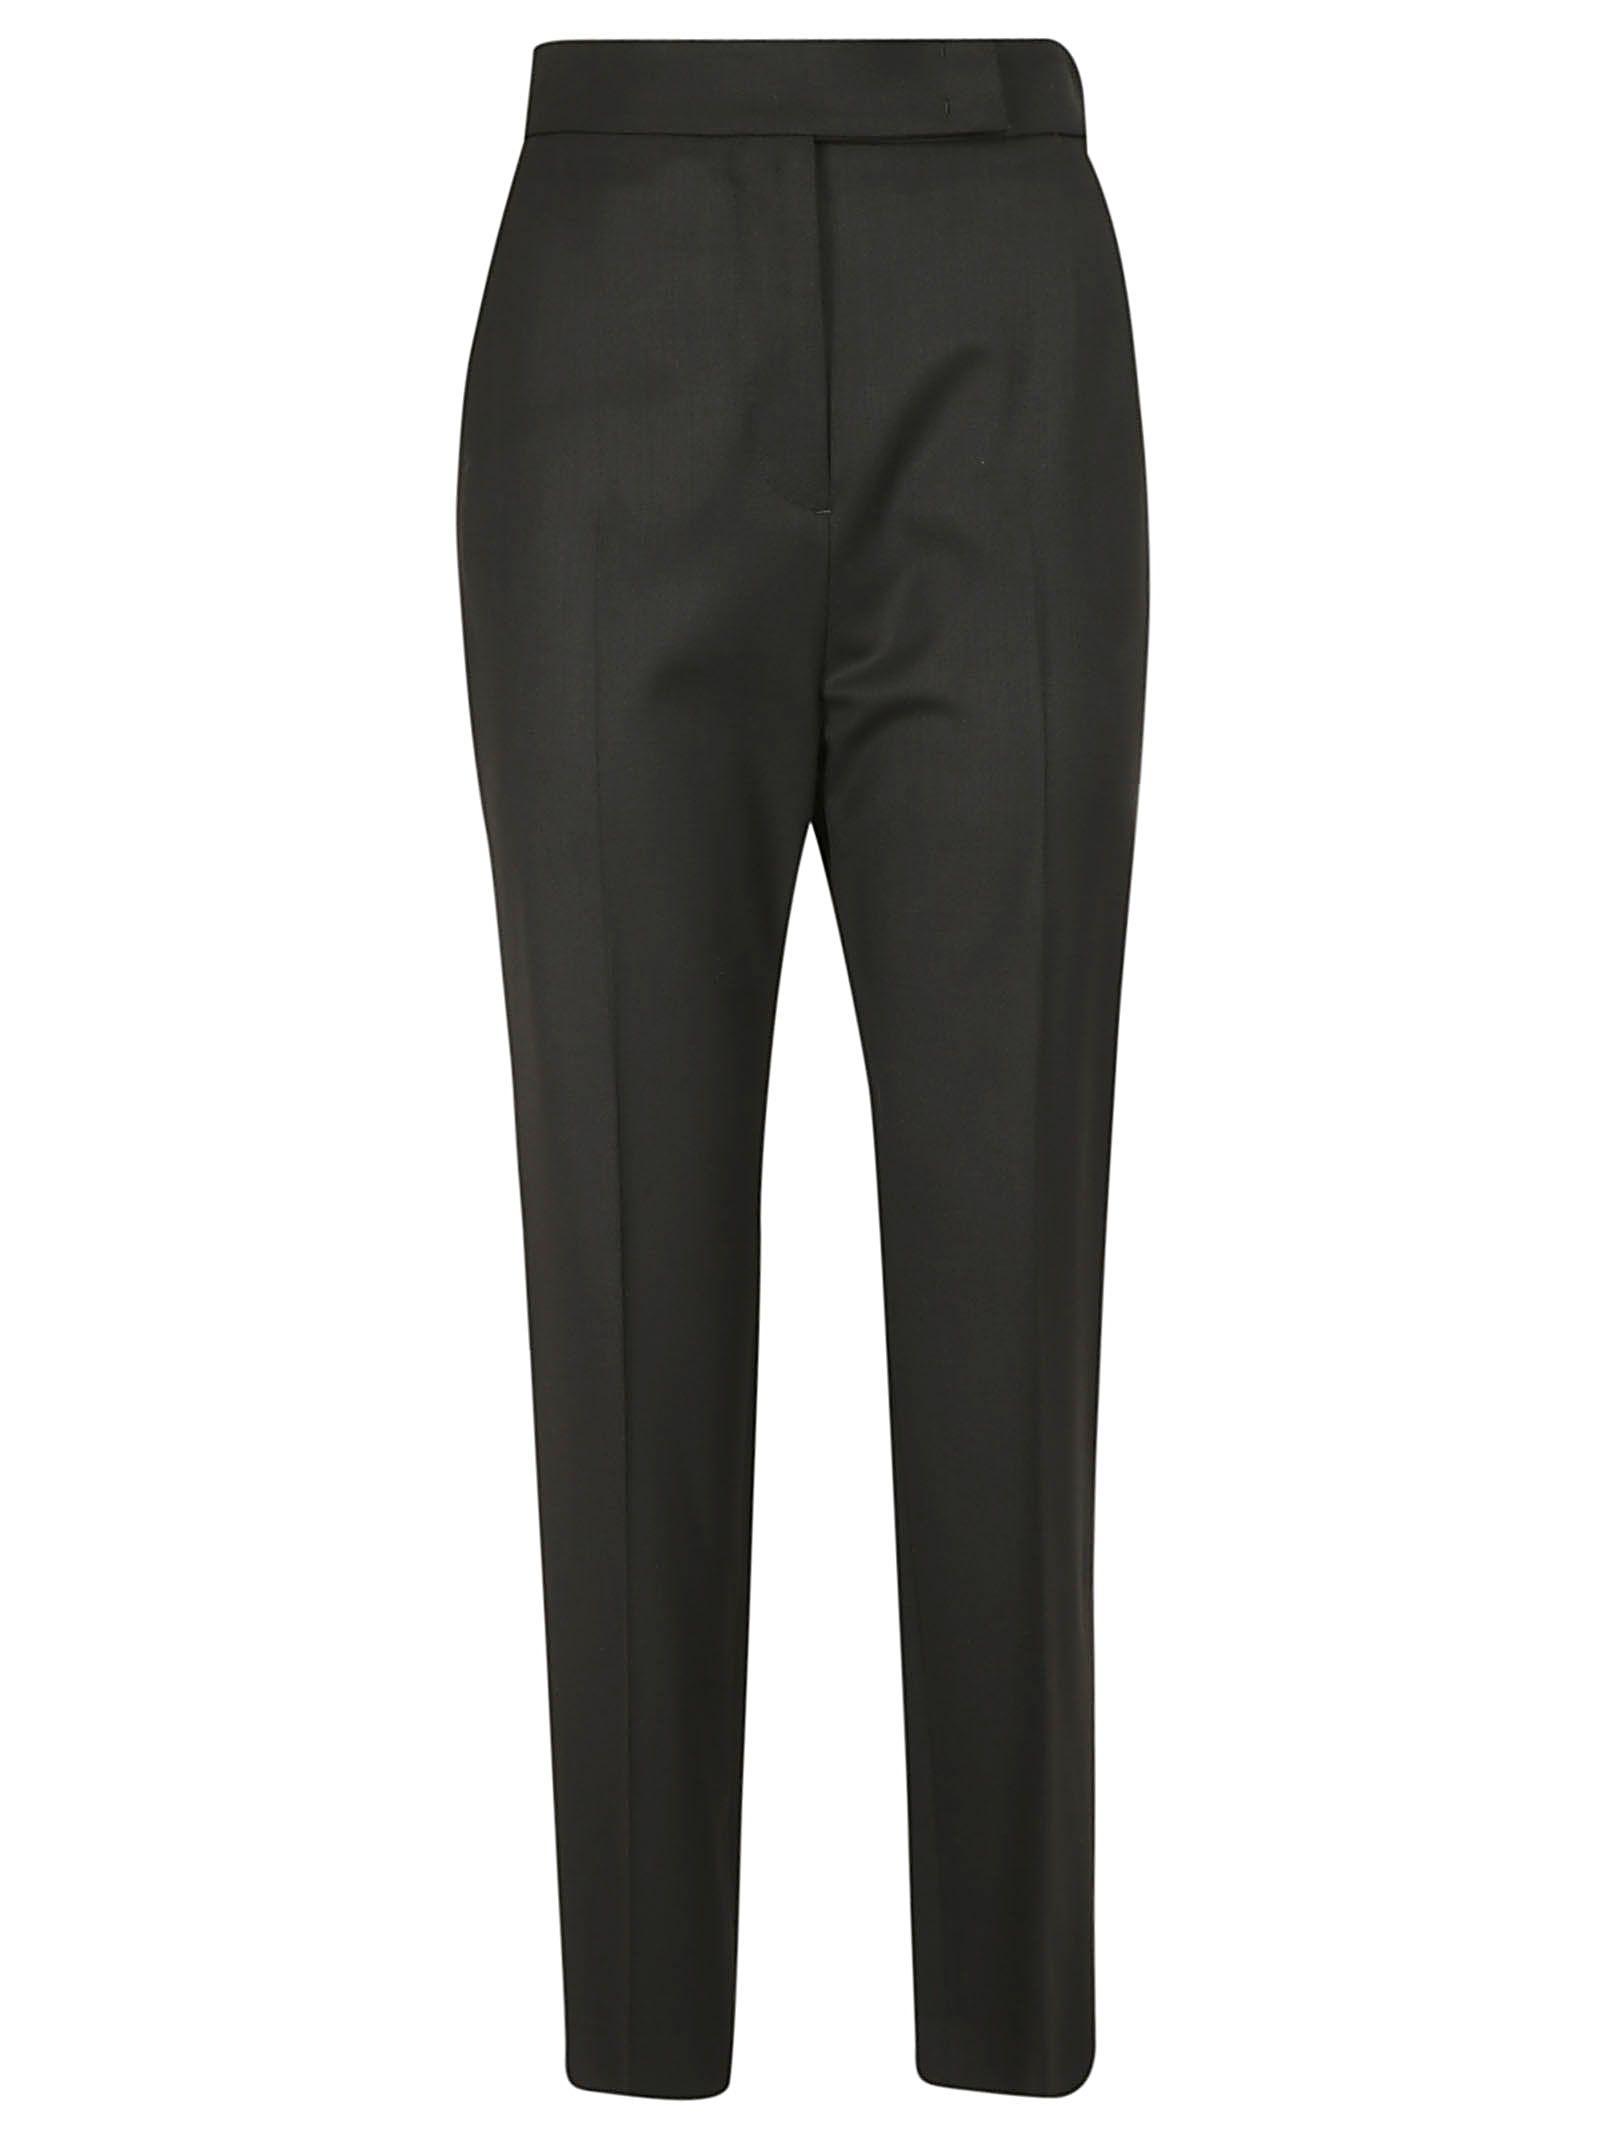 Sara Battaglia High-waisted Trousers